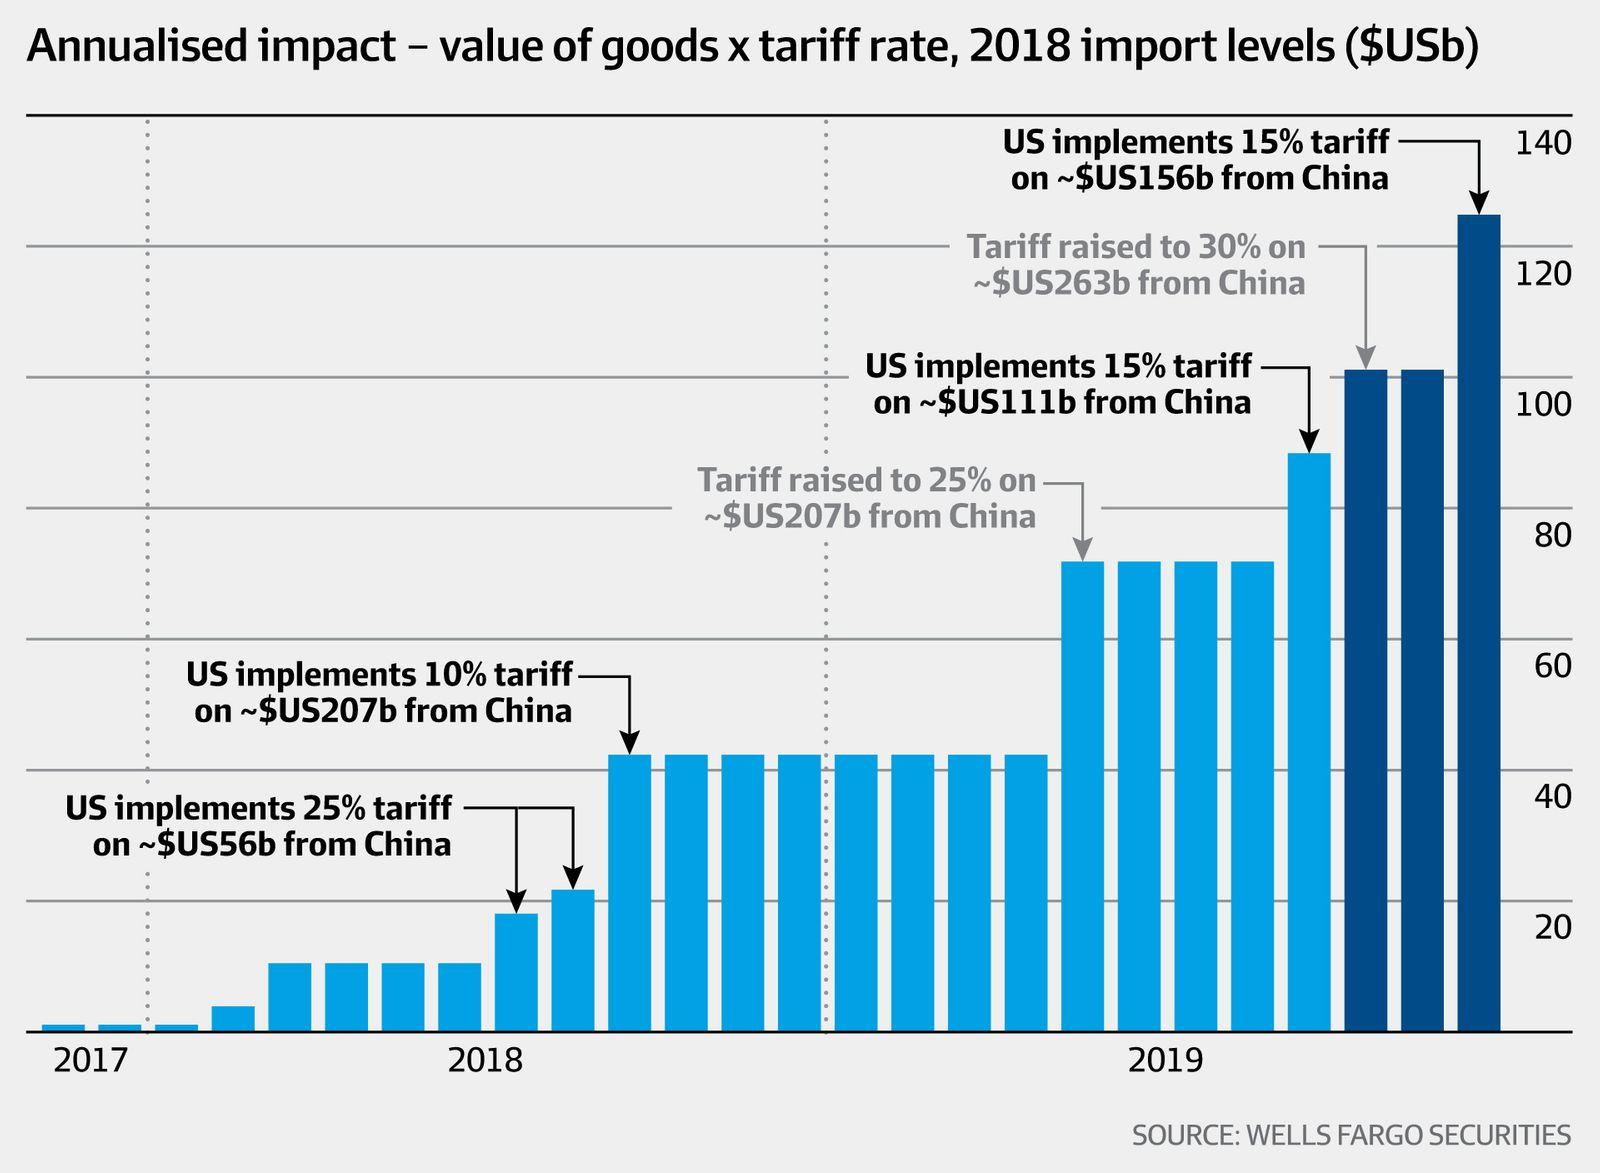 Annualised impact - value of goods x tariff rate... (Wells Fargo Securities, AFR)